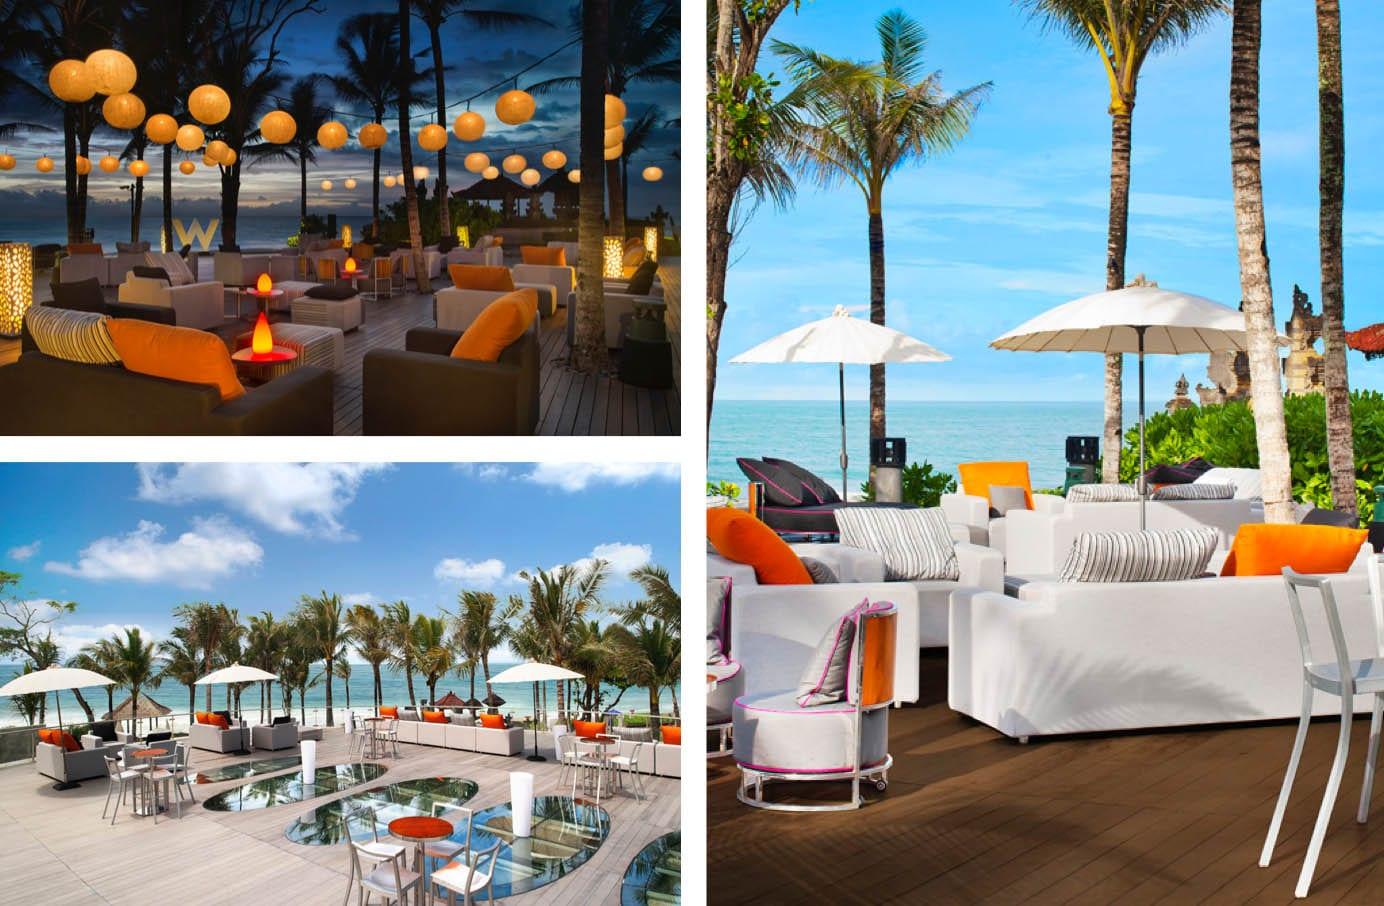 Woo-Bar-W-Retreat-Spa-Bali